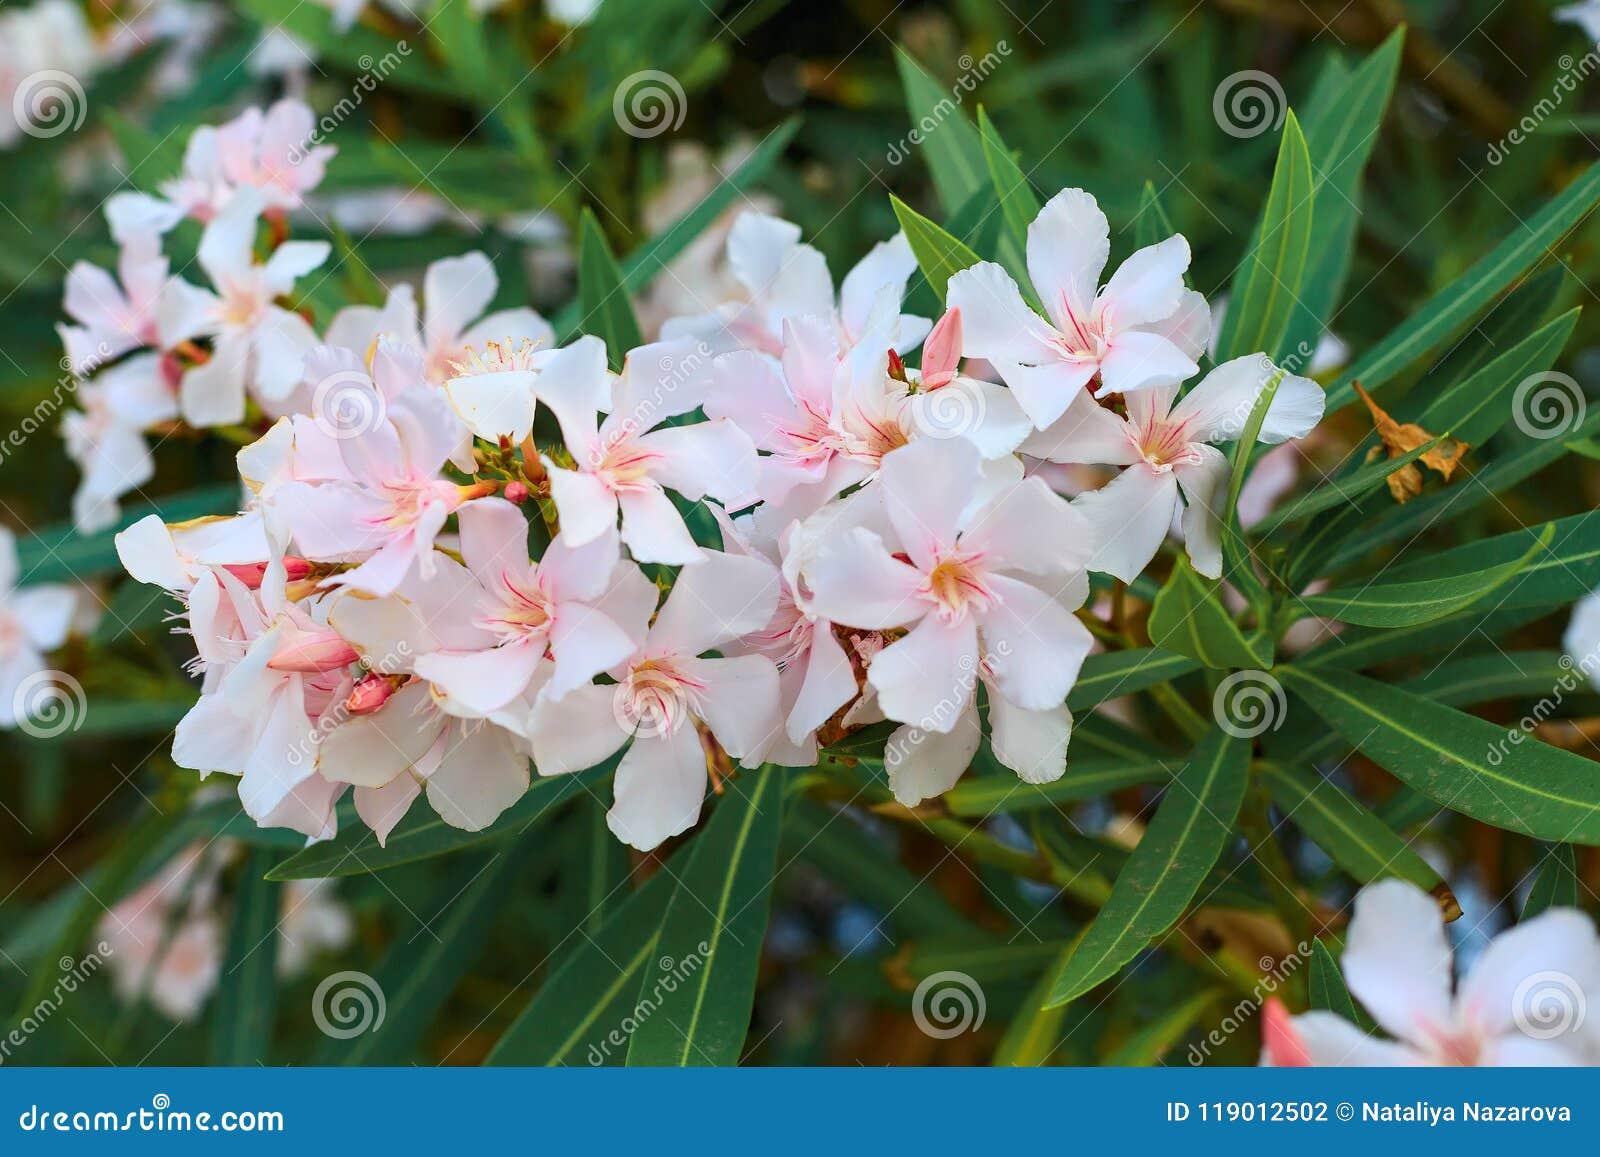 White oleander in bloom green leaves stock photo image of flower white oleander in bloom green leaves mightylinksfo